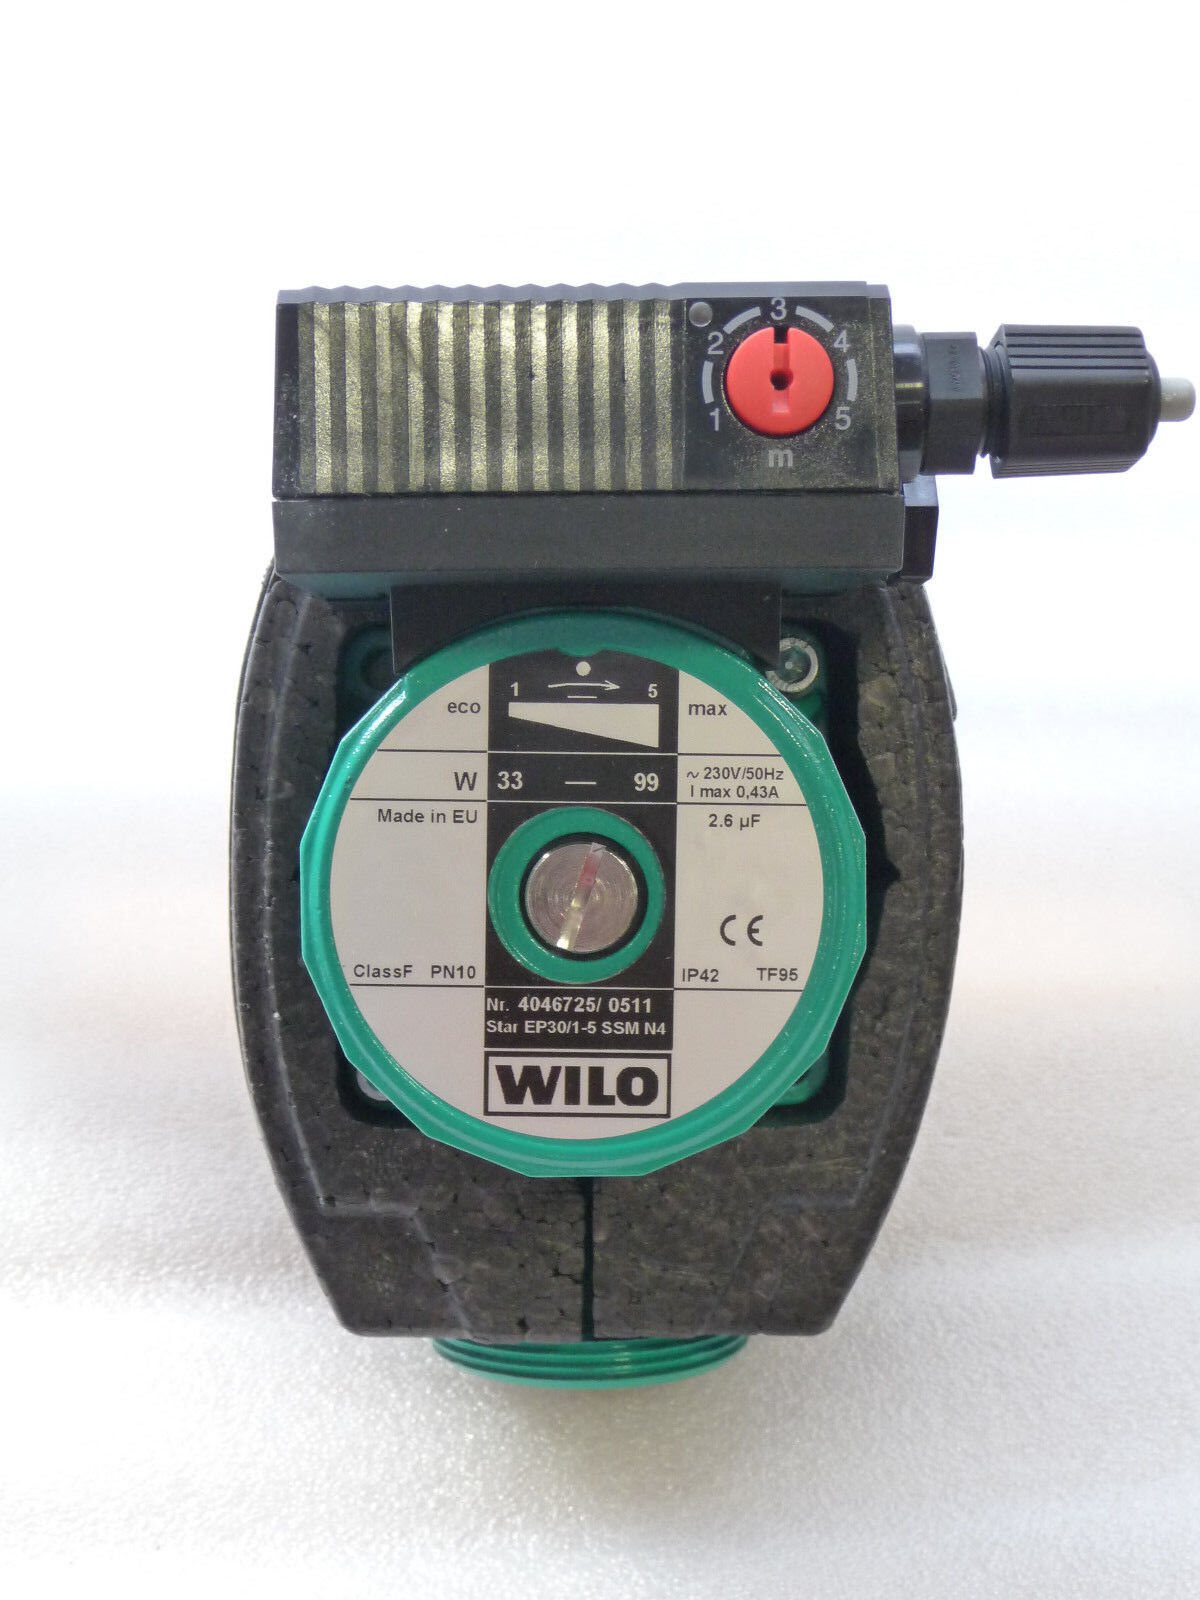 Wilo Star Star Star E P 30 / 1- 5 SSM Heizungspumpe 230 Volt Umwälzpumpe 180 mm NEU P5815 c9255c